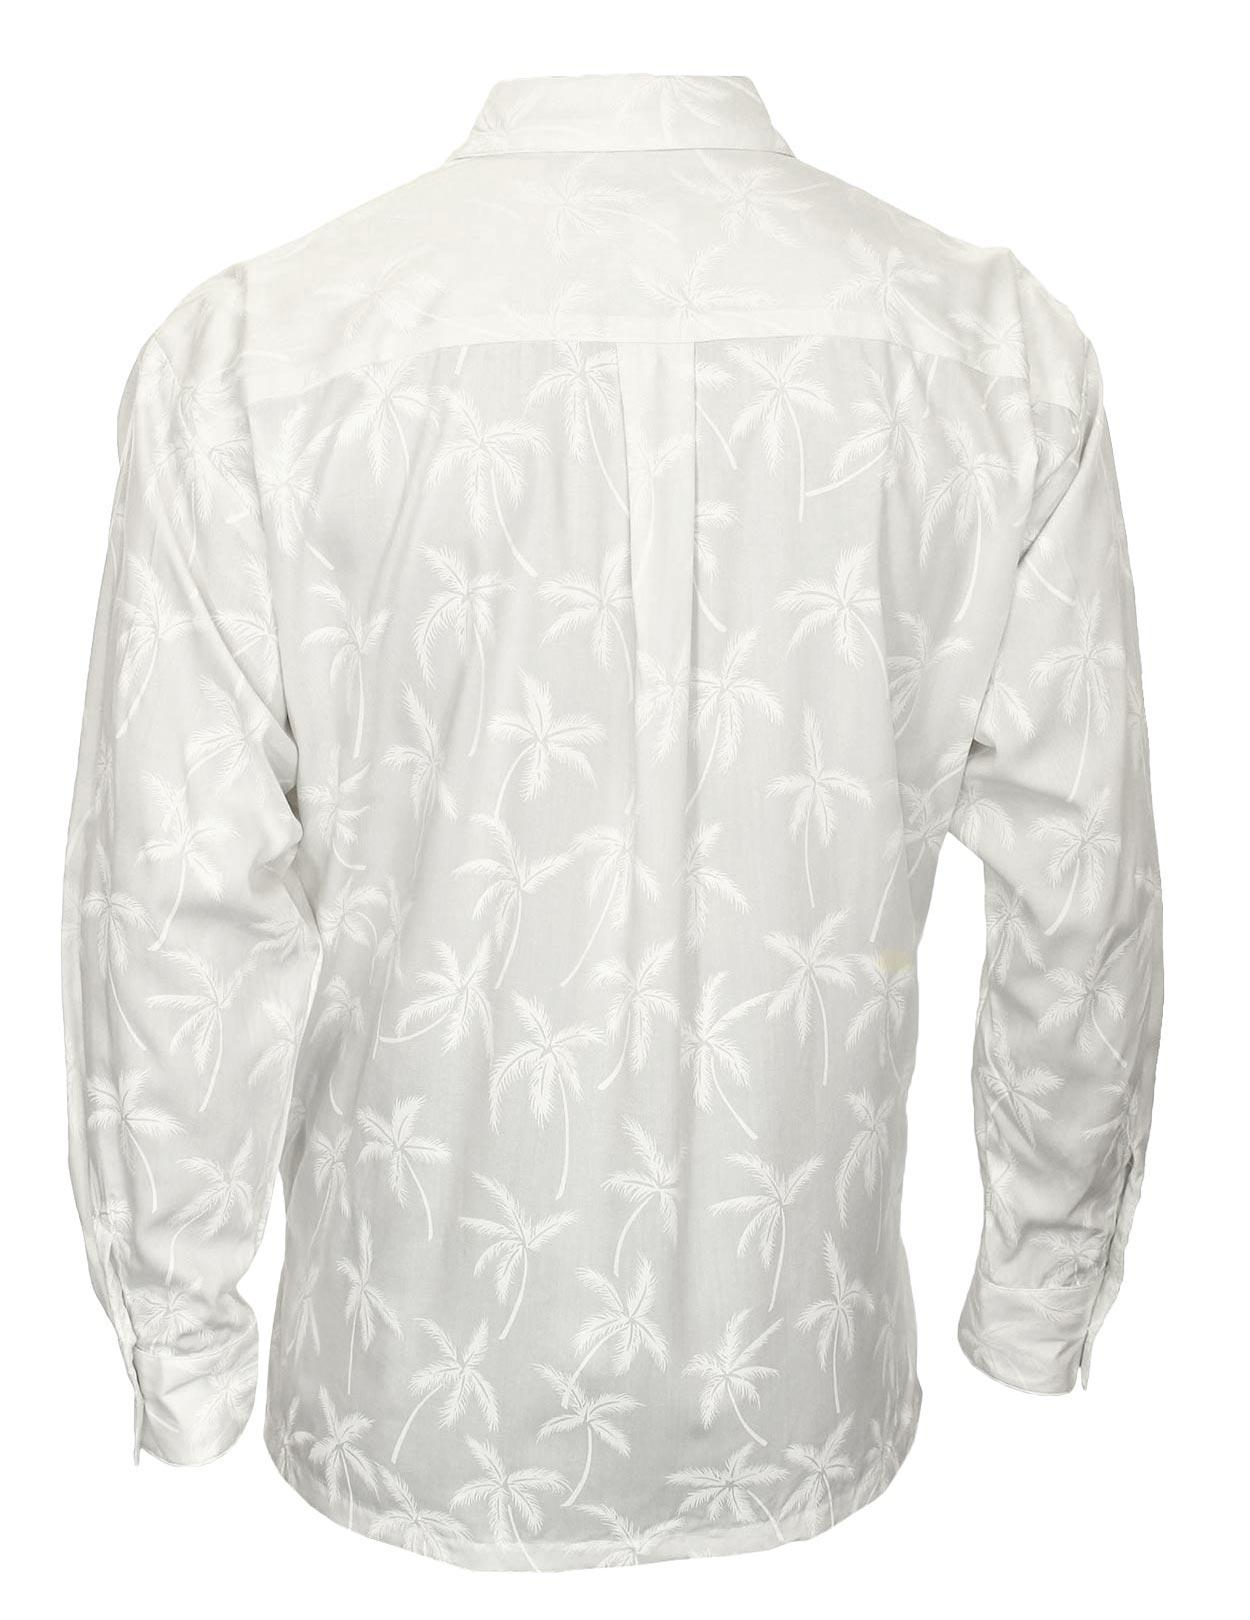 Long Sleeves Rayon Tropical Palms Hawaiian White Shirt Shaka Time Hawaii Clo